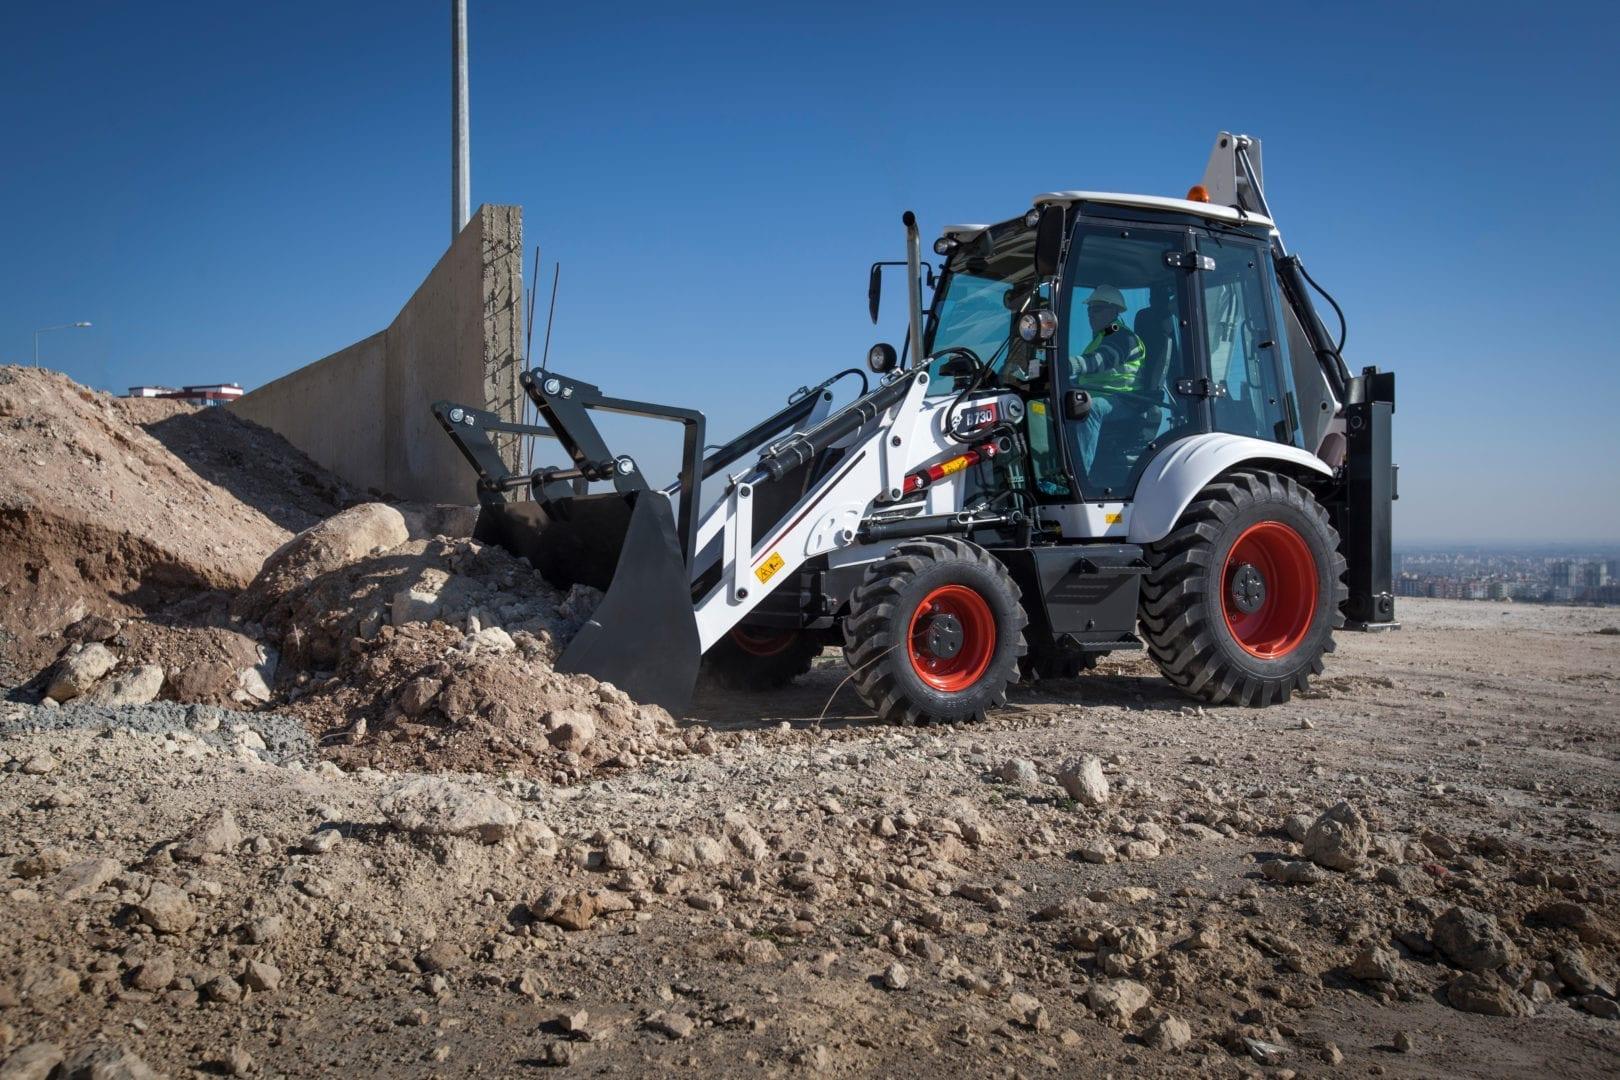 Special financing deal for Bobcat equipment